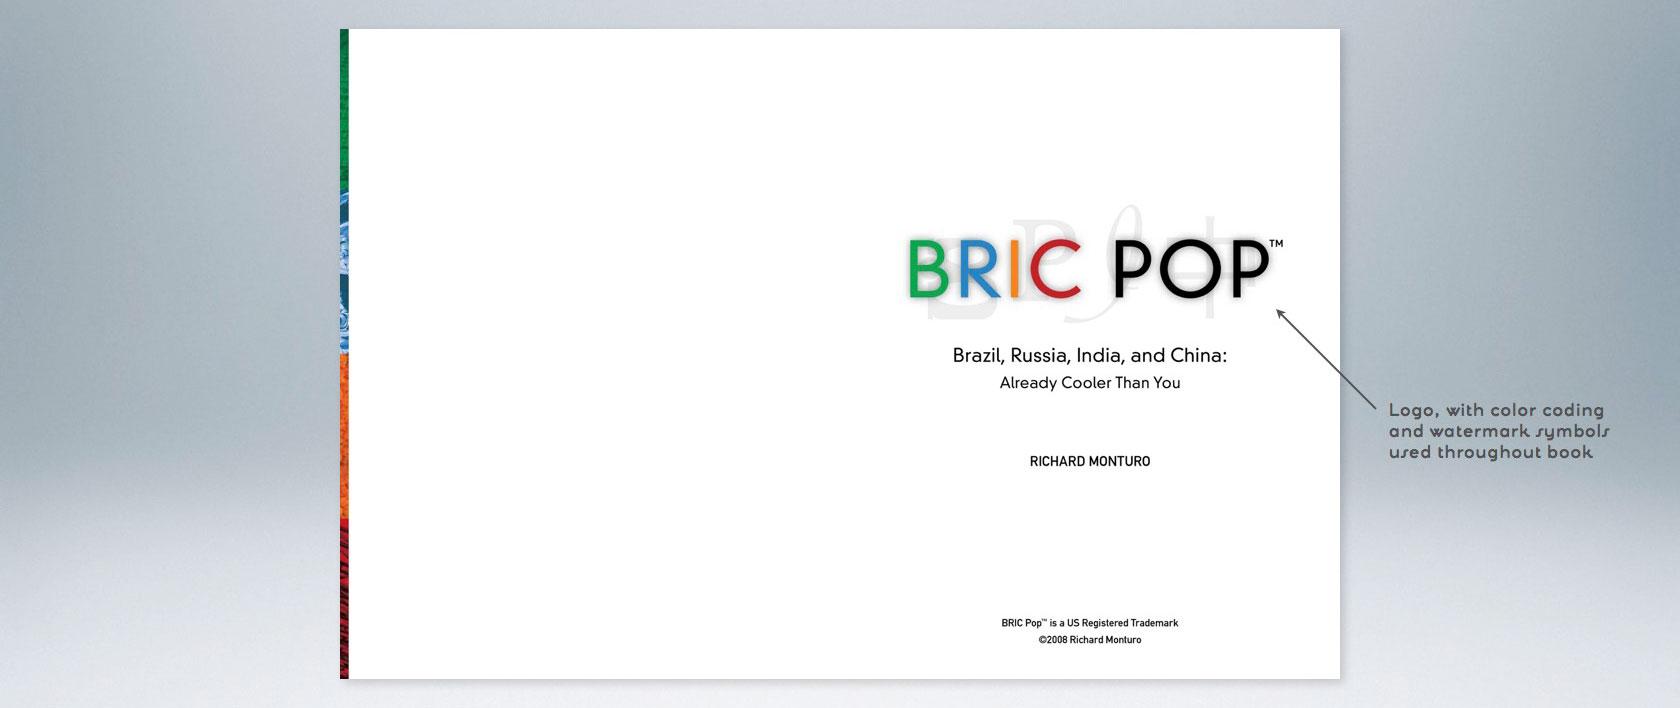 BRIC POP Inside Cover